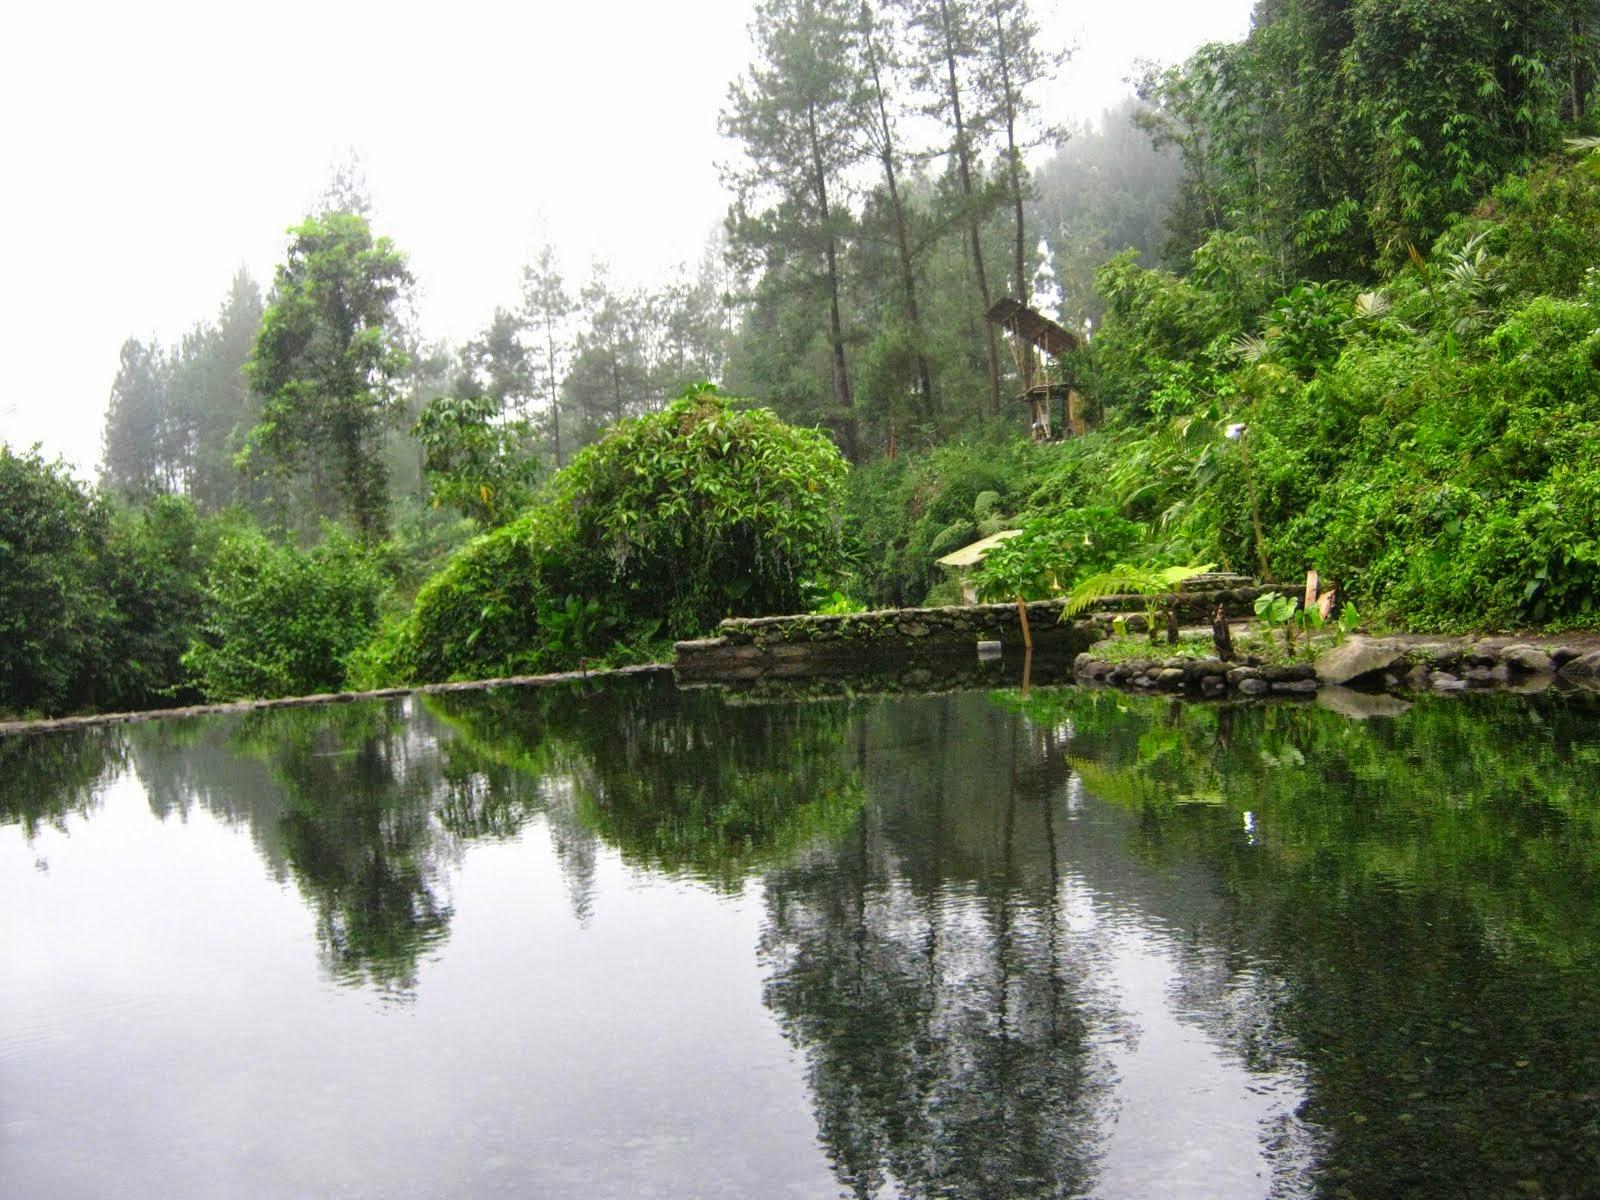 Anggun Trisna Reflective Essay Outbond Baturraden Adventure Berikut Foto Forest